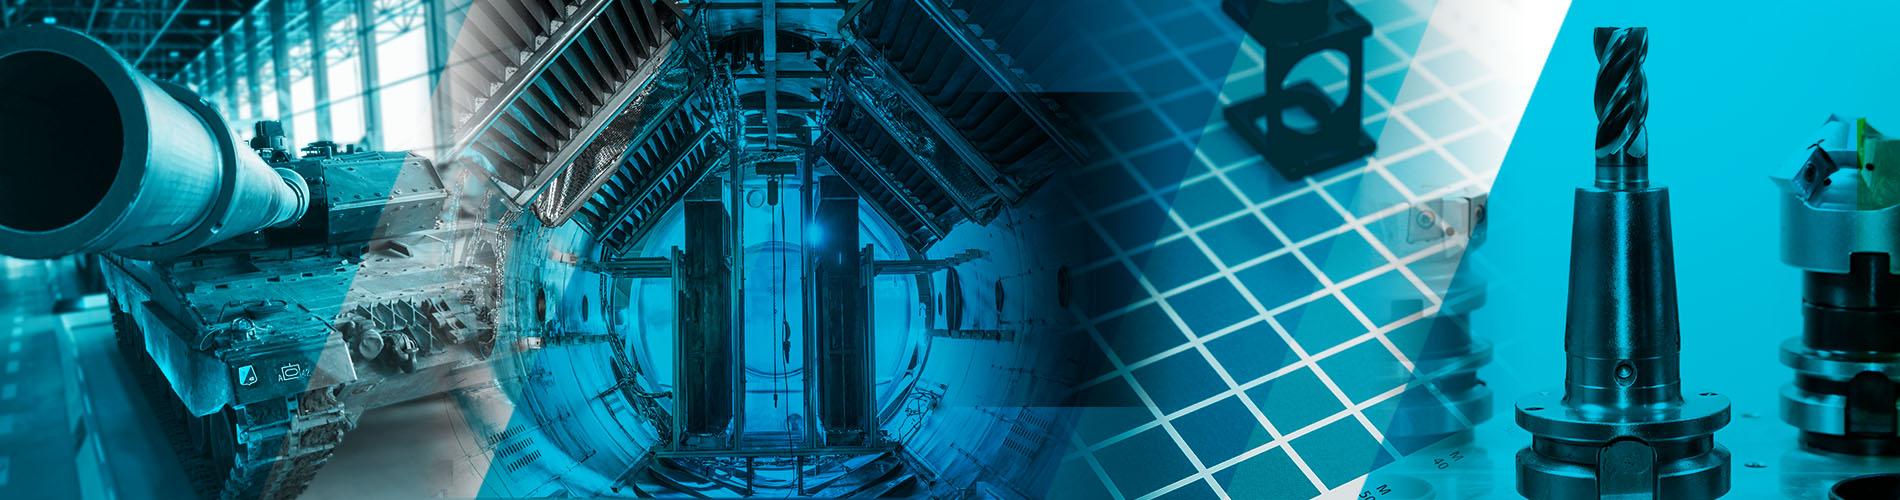 INTERAX Manufacturing Planning